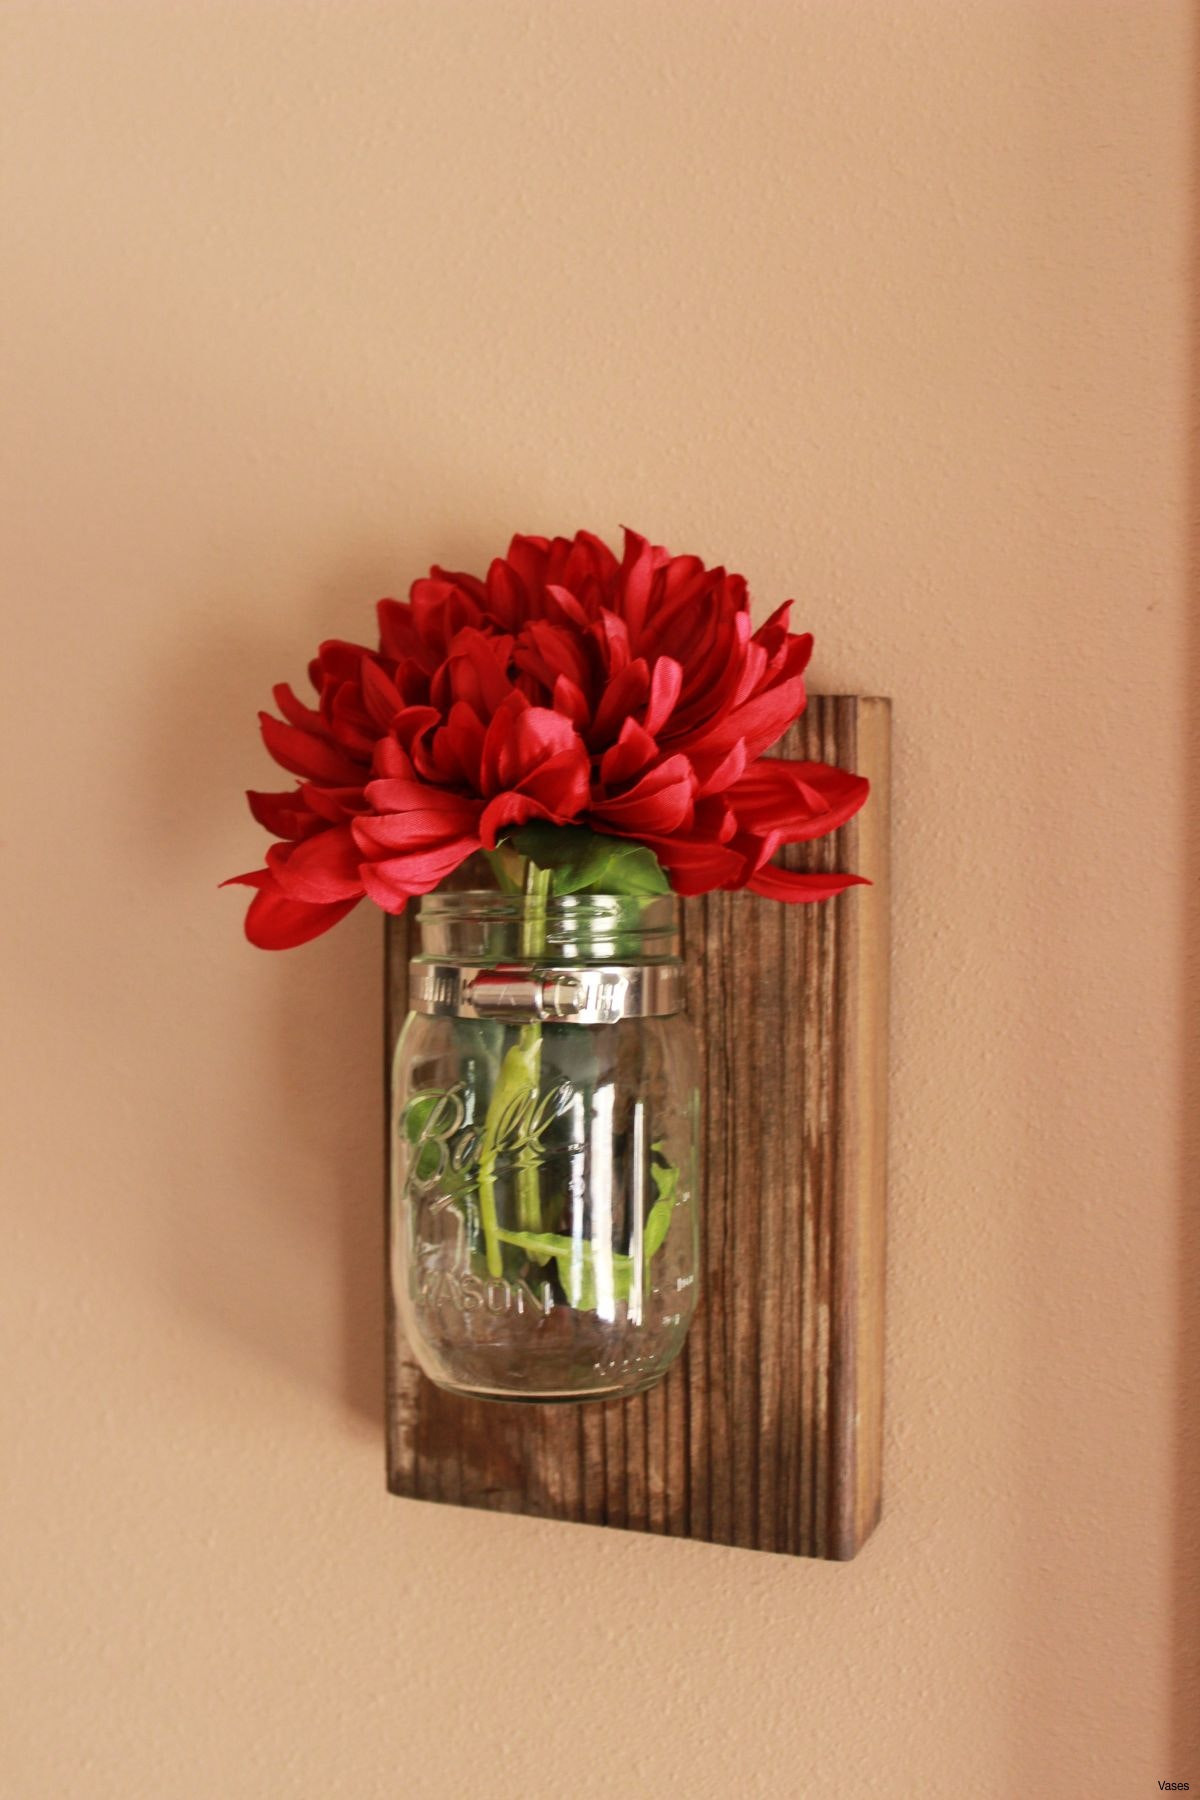 rustic metal vase of flower wall decor meilleur de il fullxfull nny9h vases flower vase regarding flower wall decor meilleur de il fullxfull nny9h vases flower vase sconces zoomi 0d wall design